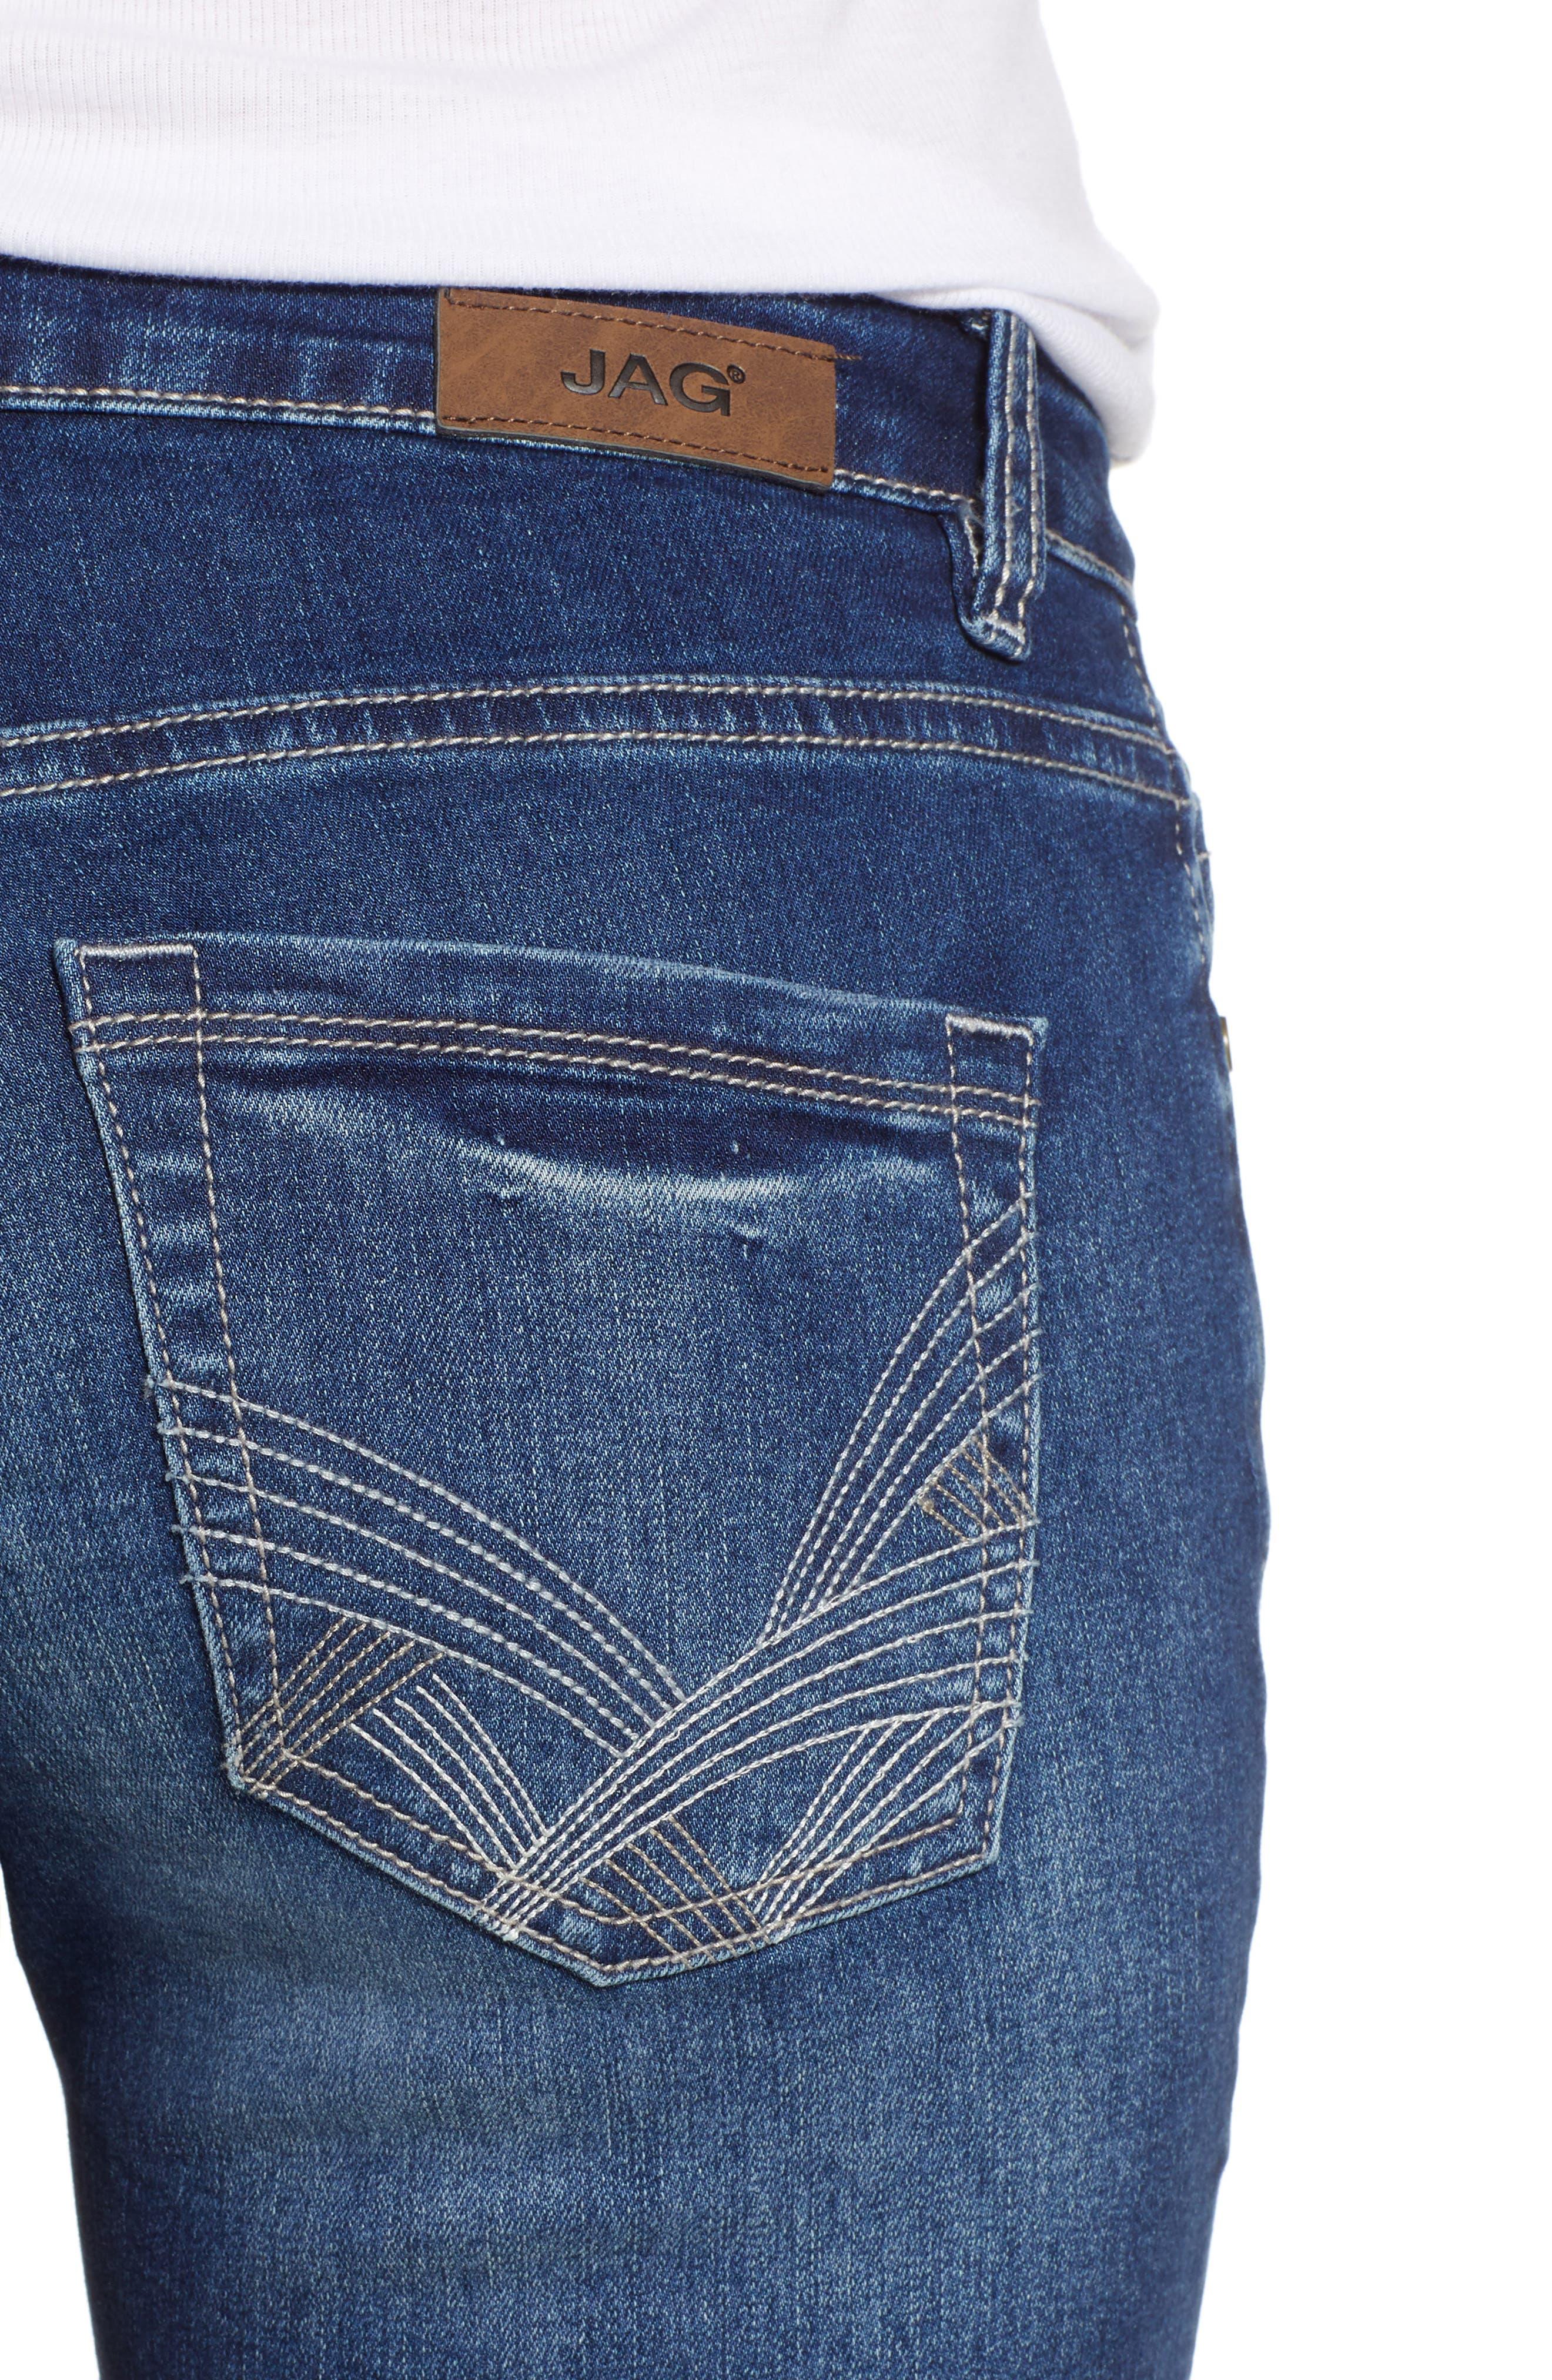 JAG JEANS, Hanna Stretch Straight Leg Jeans, Alternate thumbnail 5, color, MED INDIGO